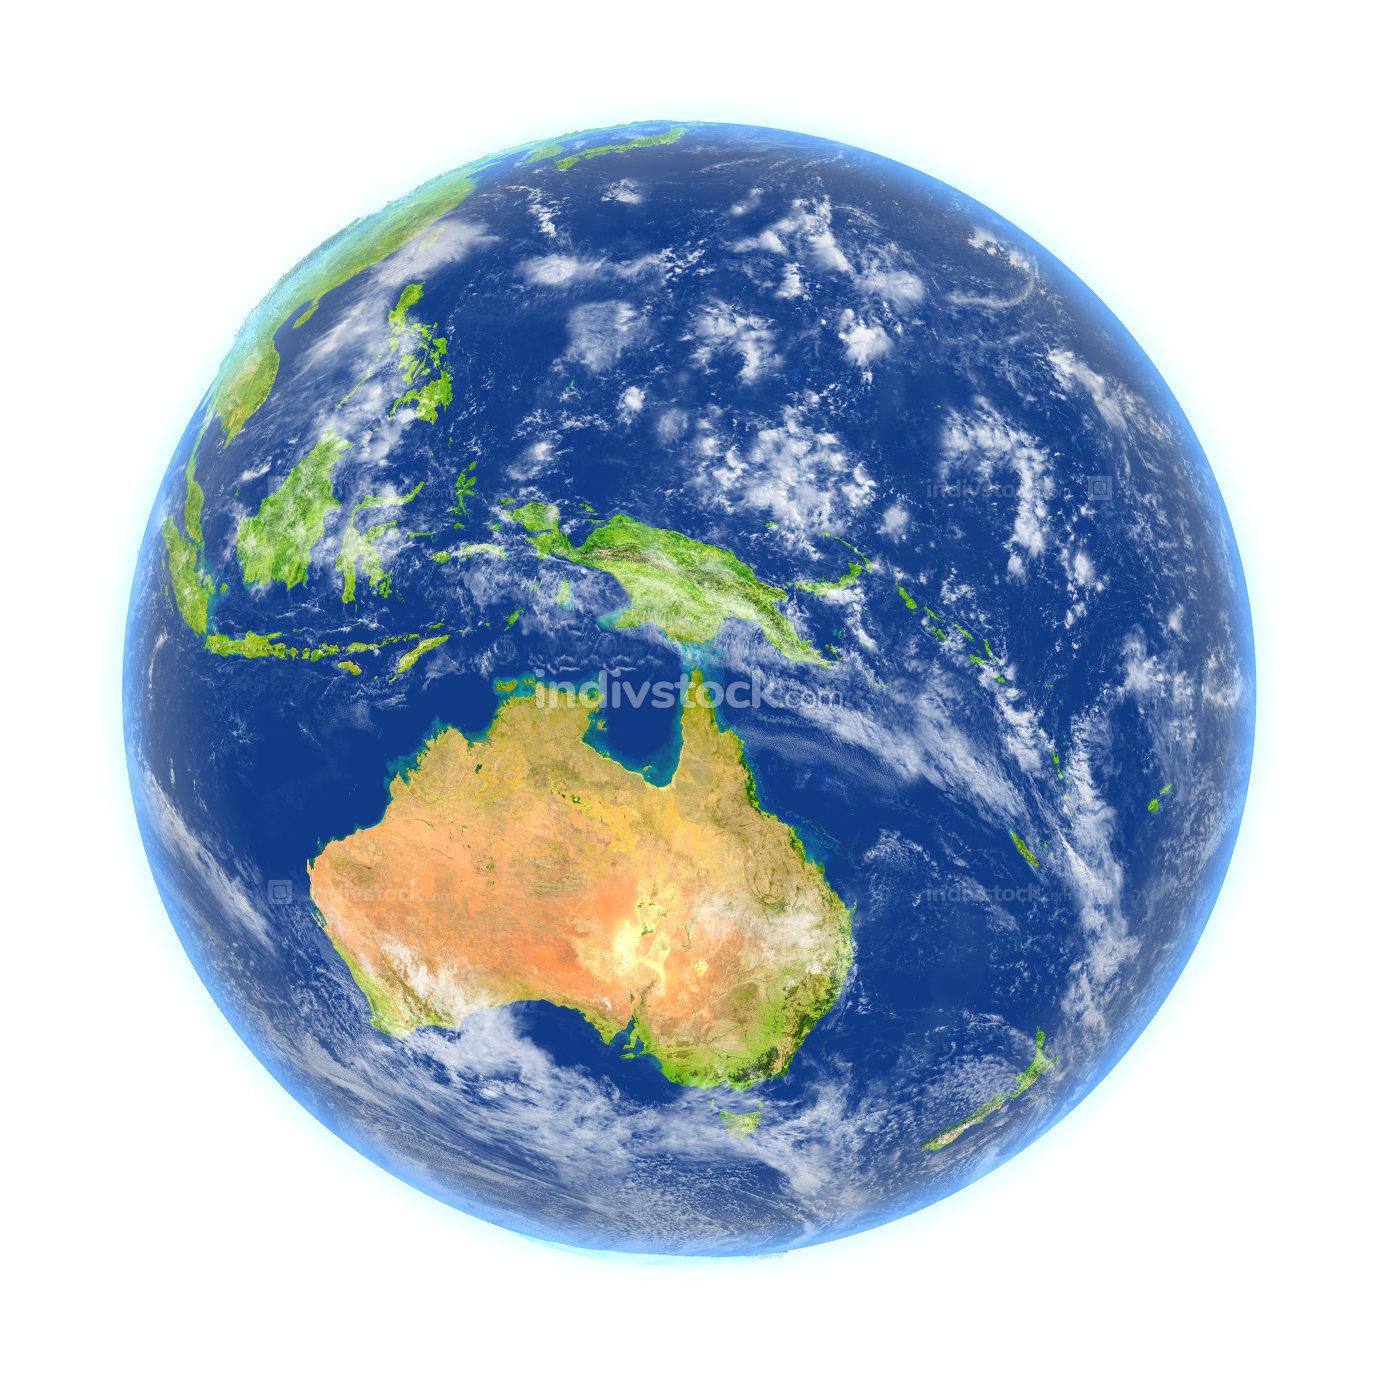 Australia on Earth isolated on white